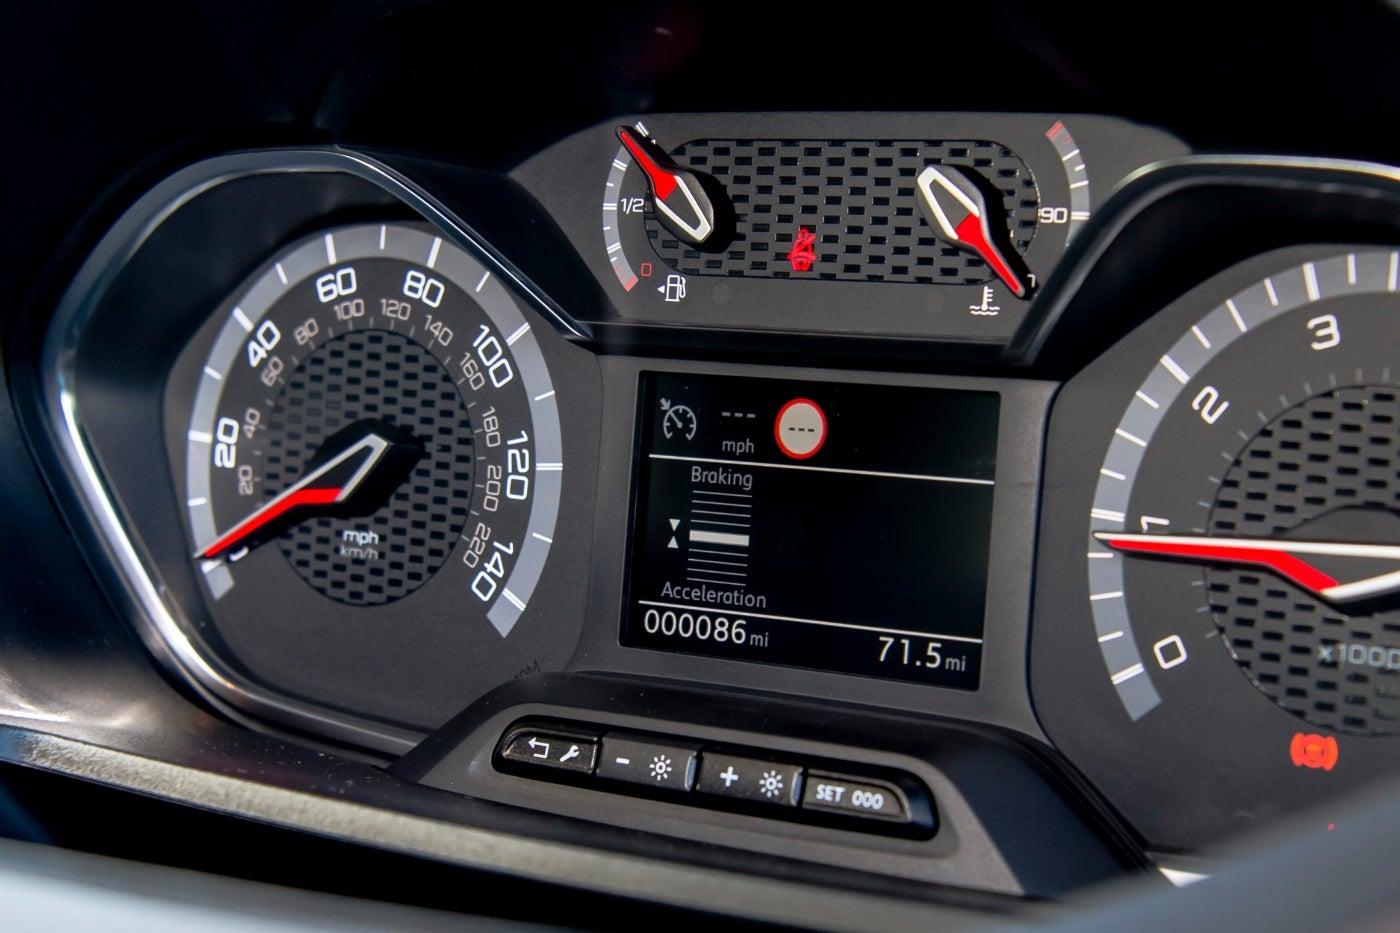 Peugeot Rifter instruments